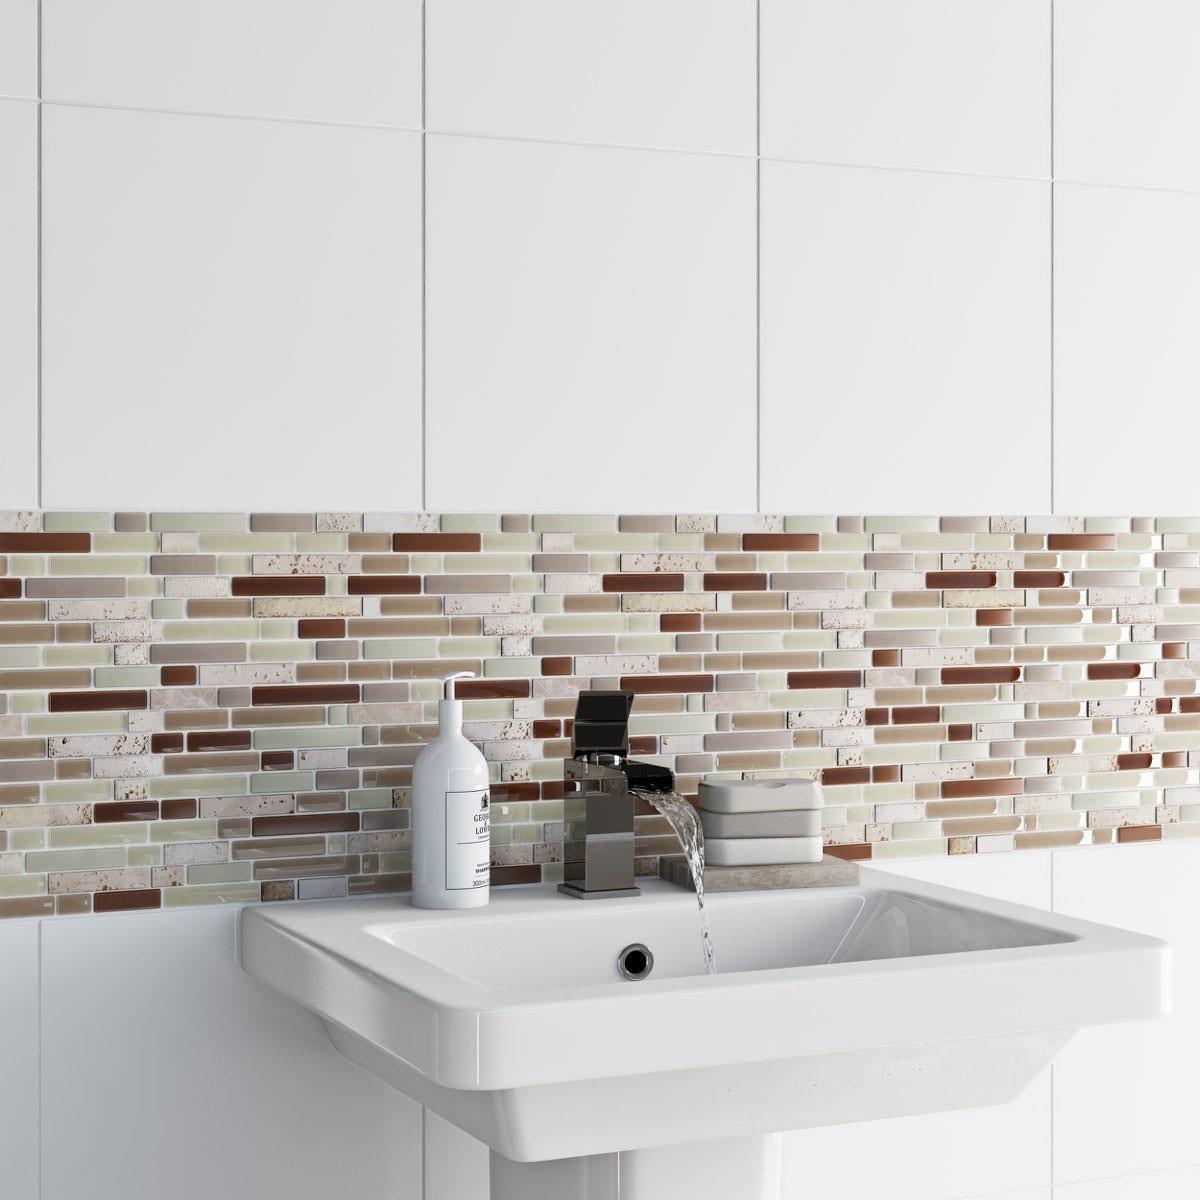 British ceramic tile mosaic nougat beige gloss tile 300mm x 300mm british ceramic tile mosaic nougat beige gloss tile 300mm x 300mm 1 sheet dailygadgetfo Images